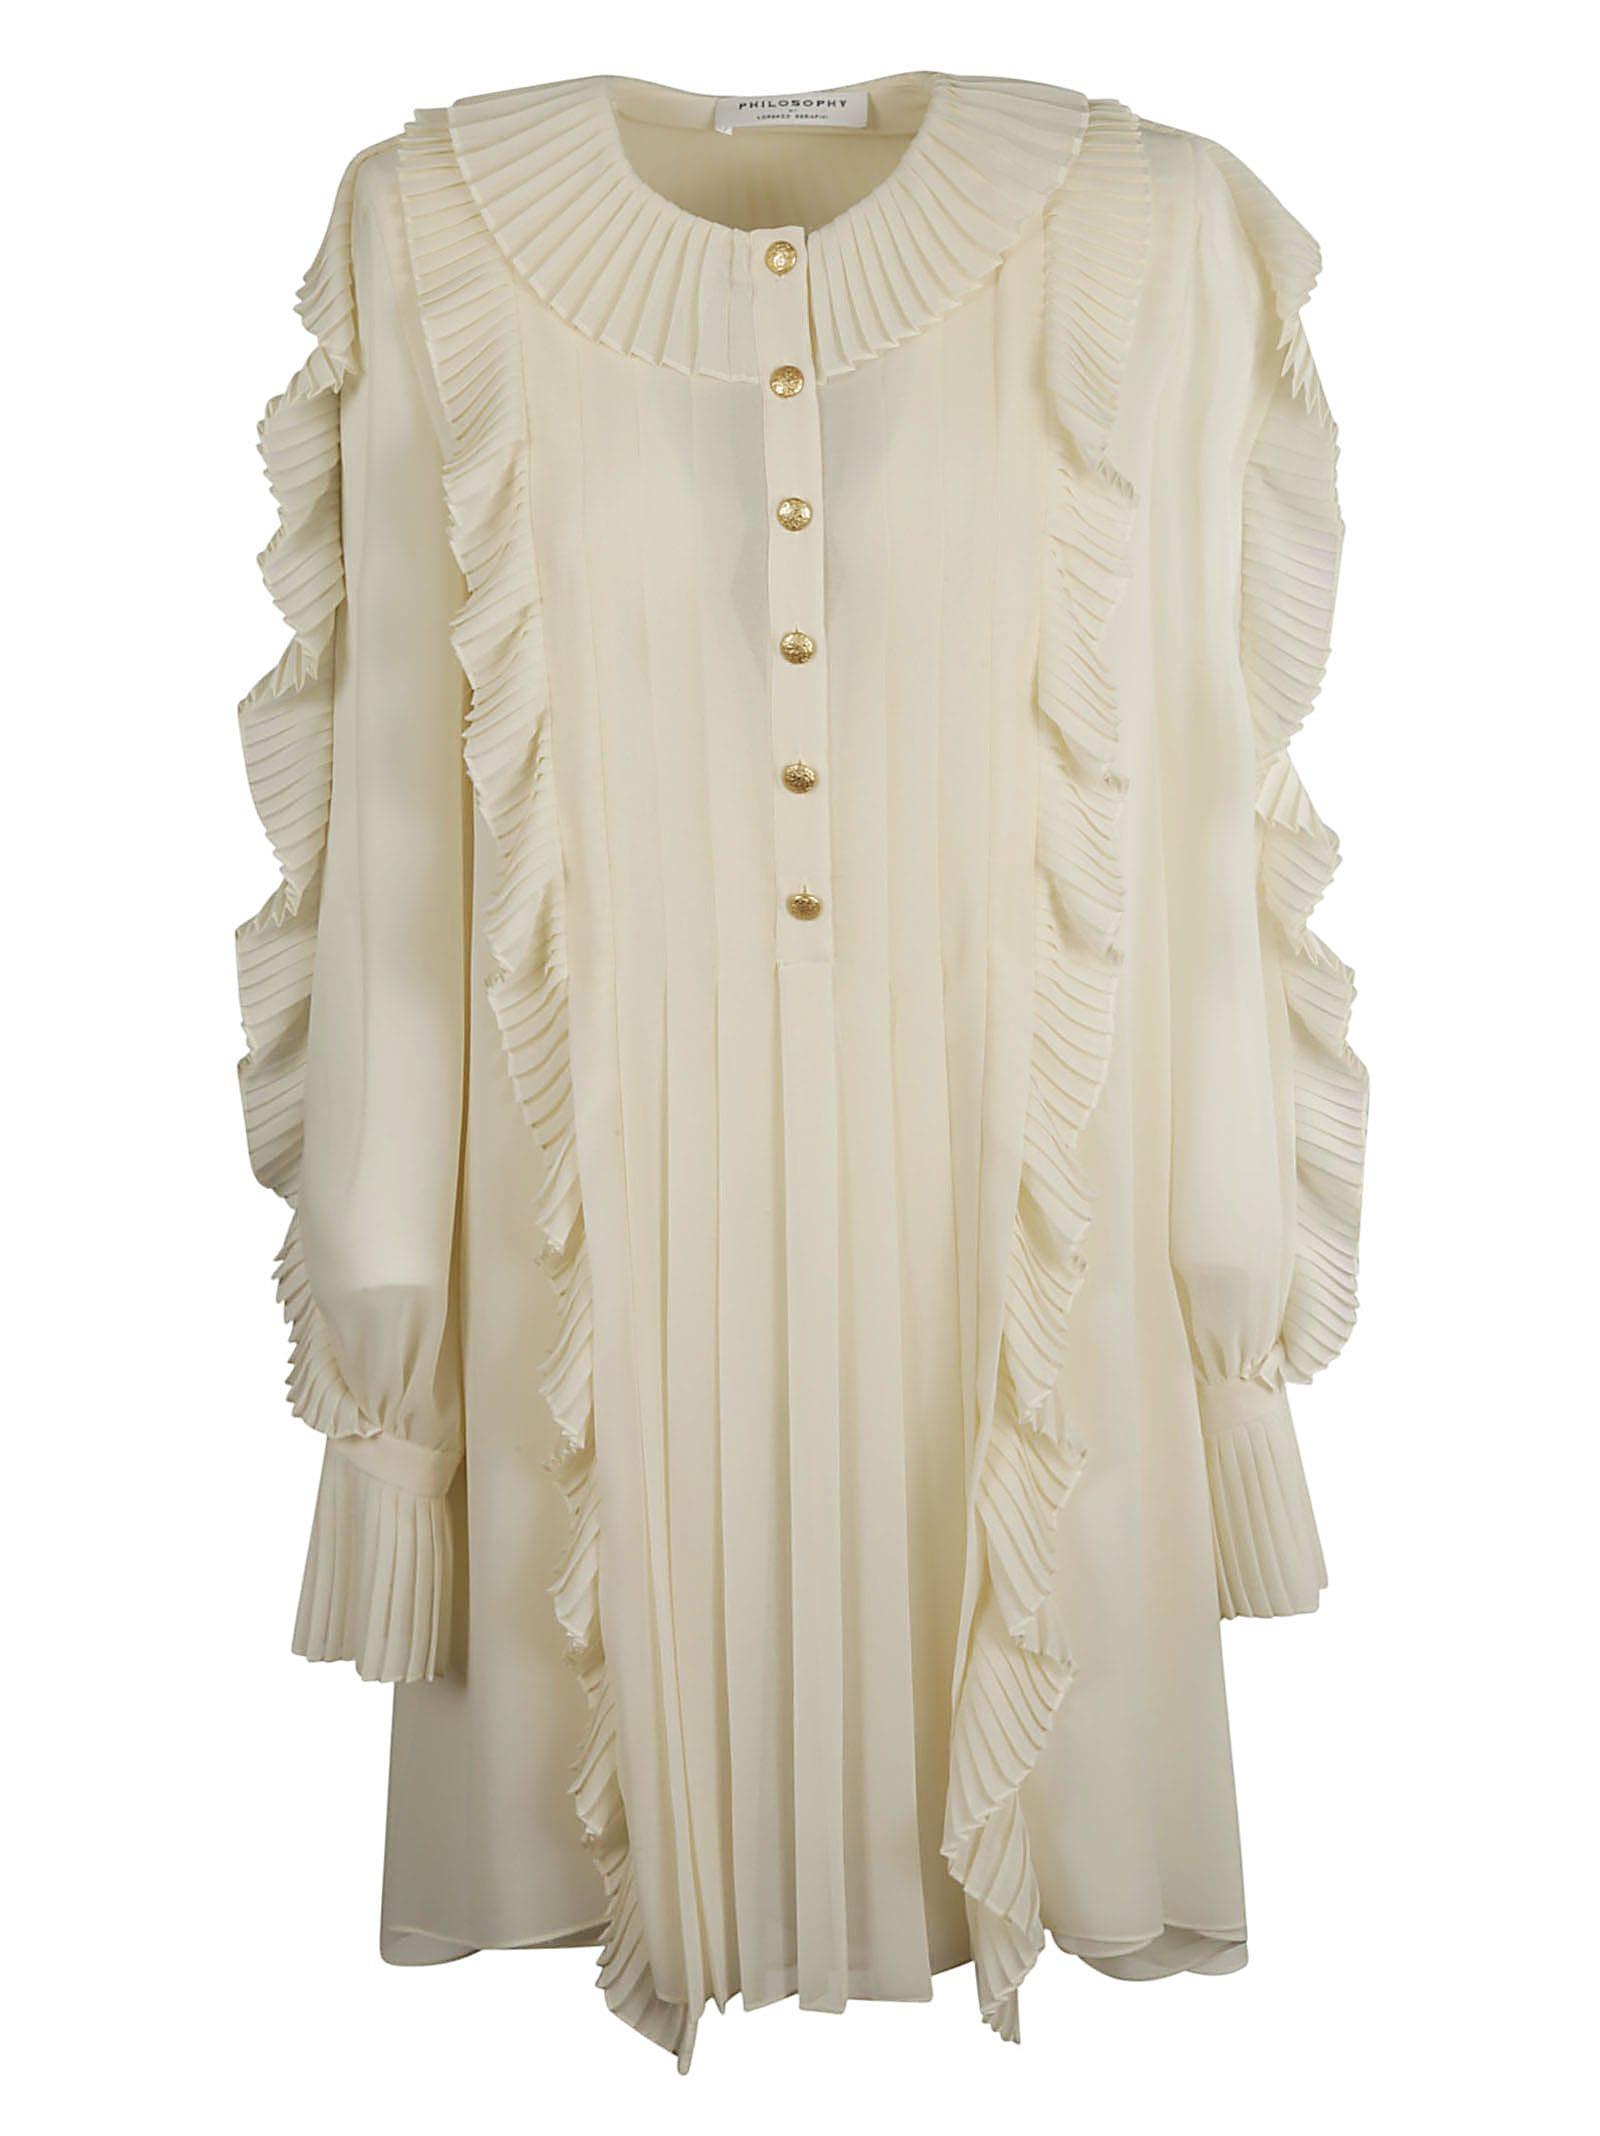 Buy Philosophy di Lorenzo Serafini Ruffled Dress online, shop Philosophy di Lorenzo Serafini with free shipping